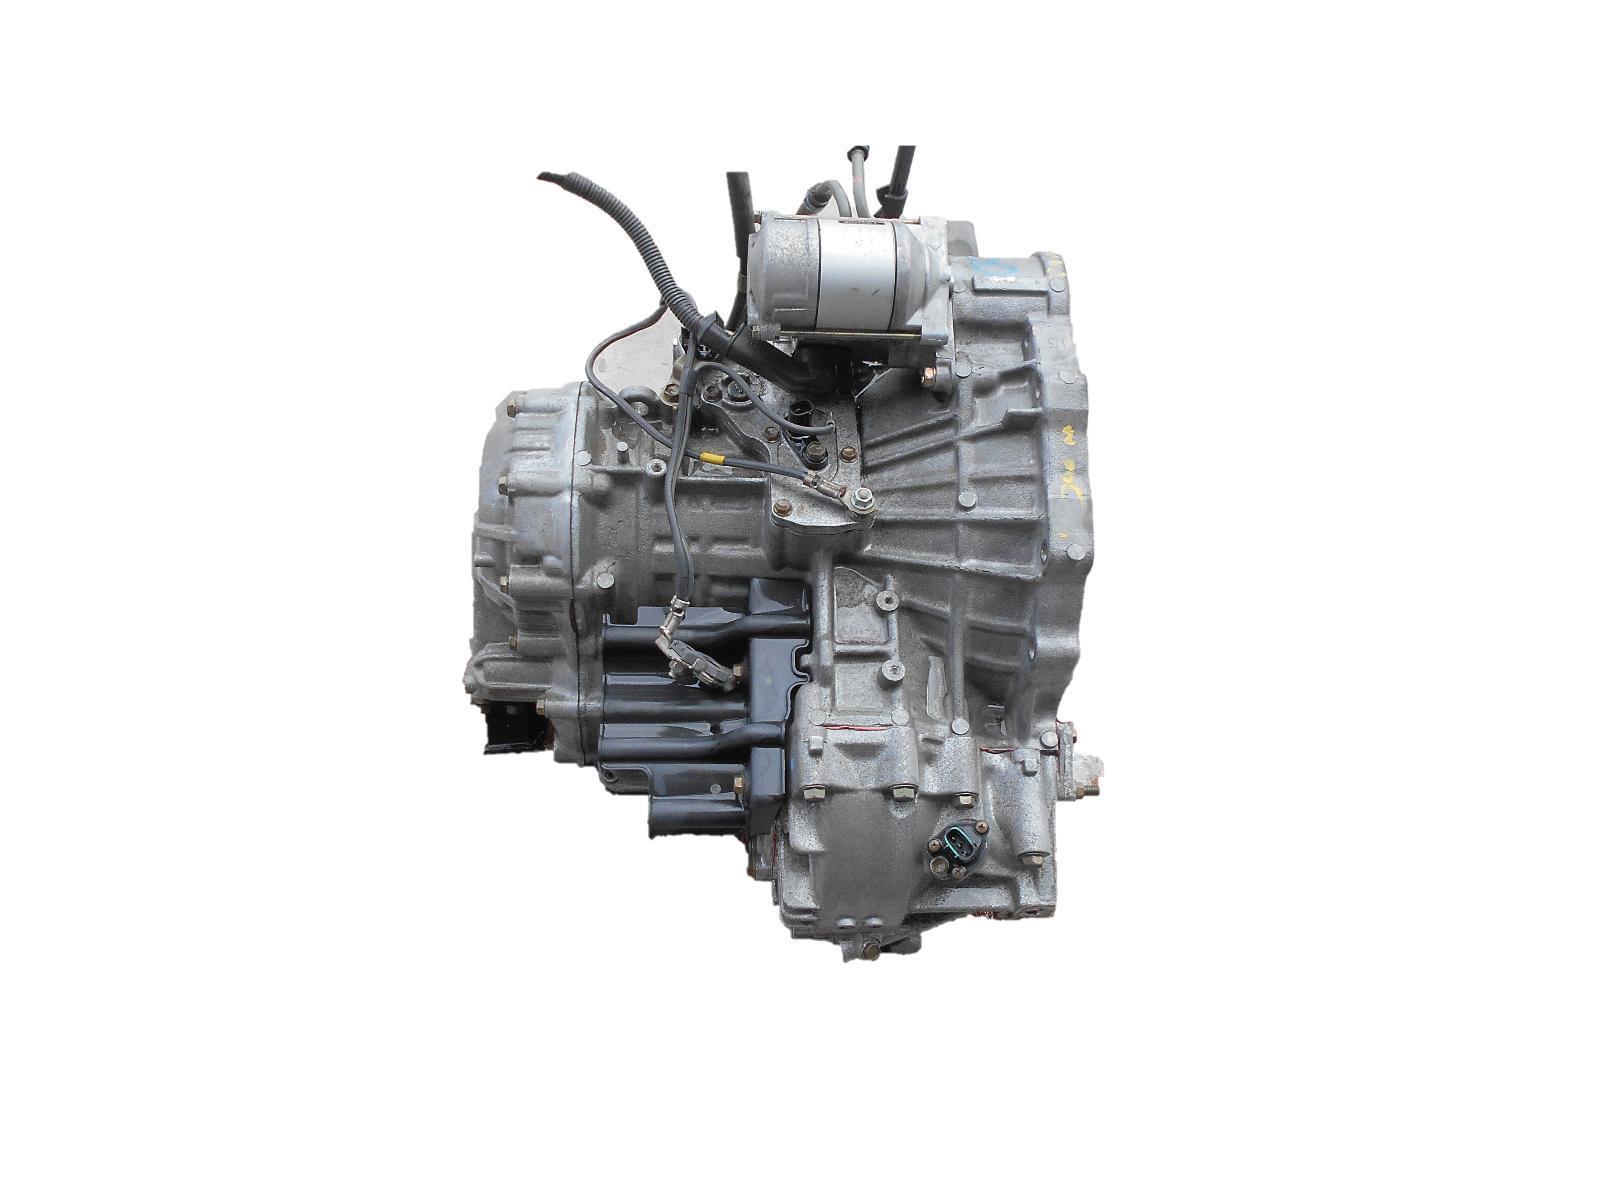 LEXUS ES300, Trans/Gearbox, AUTO, 3.0, 1MZ, MCV20, 10/96-10/01